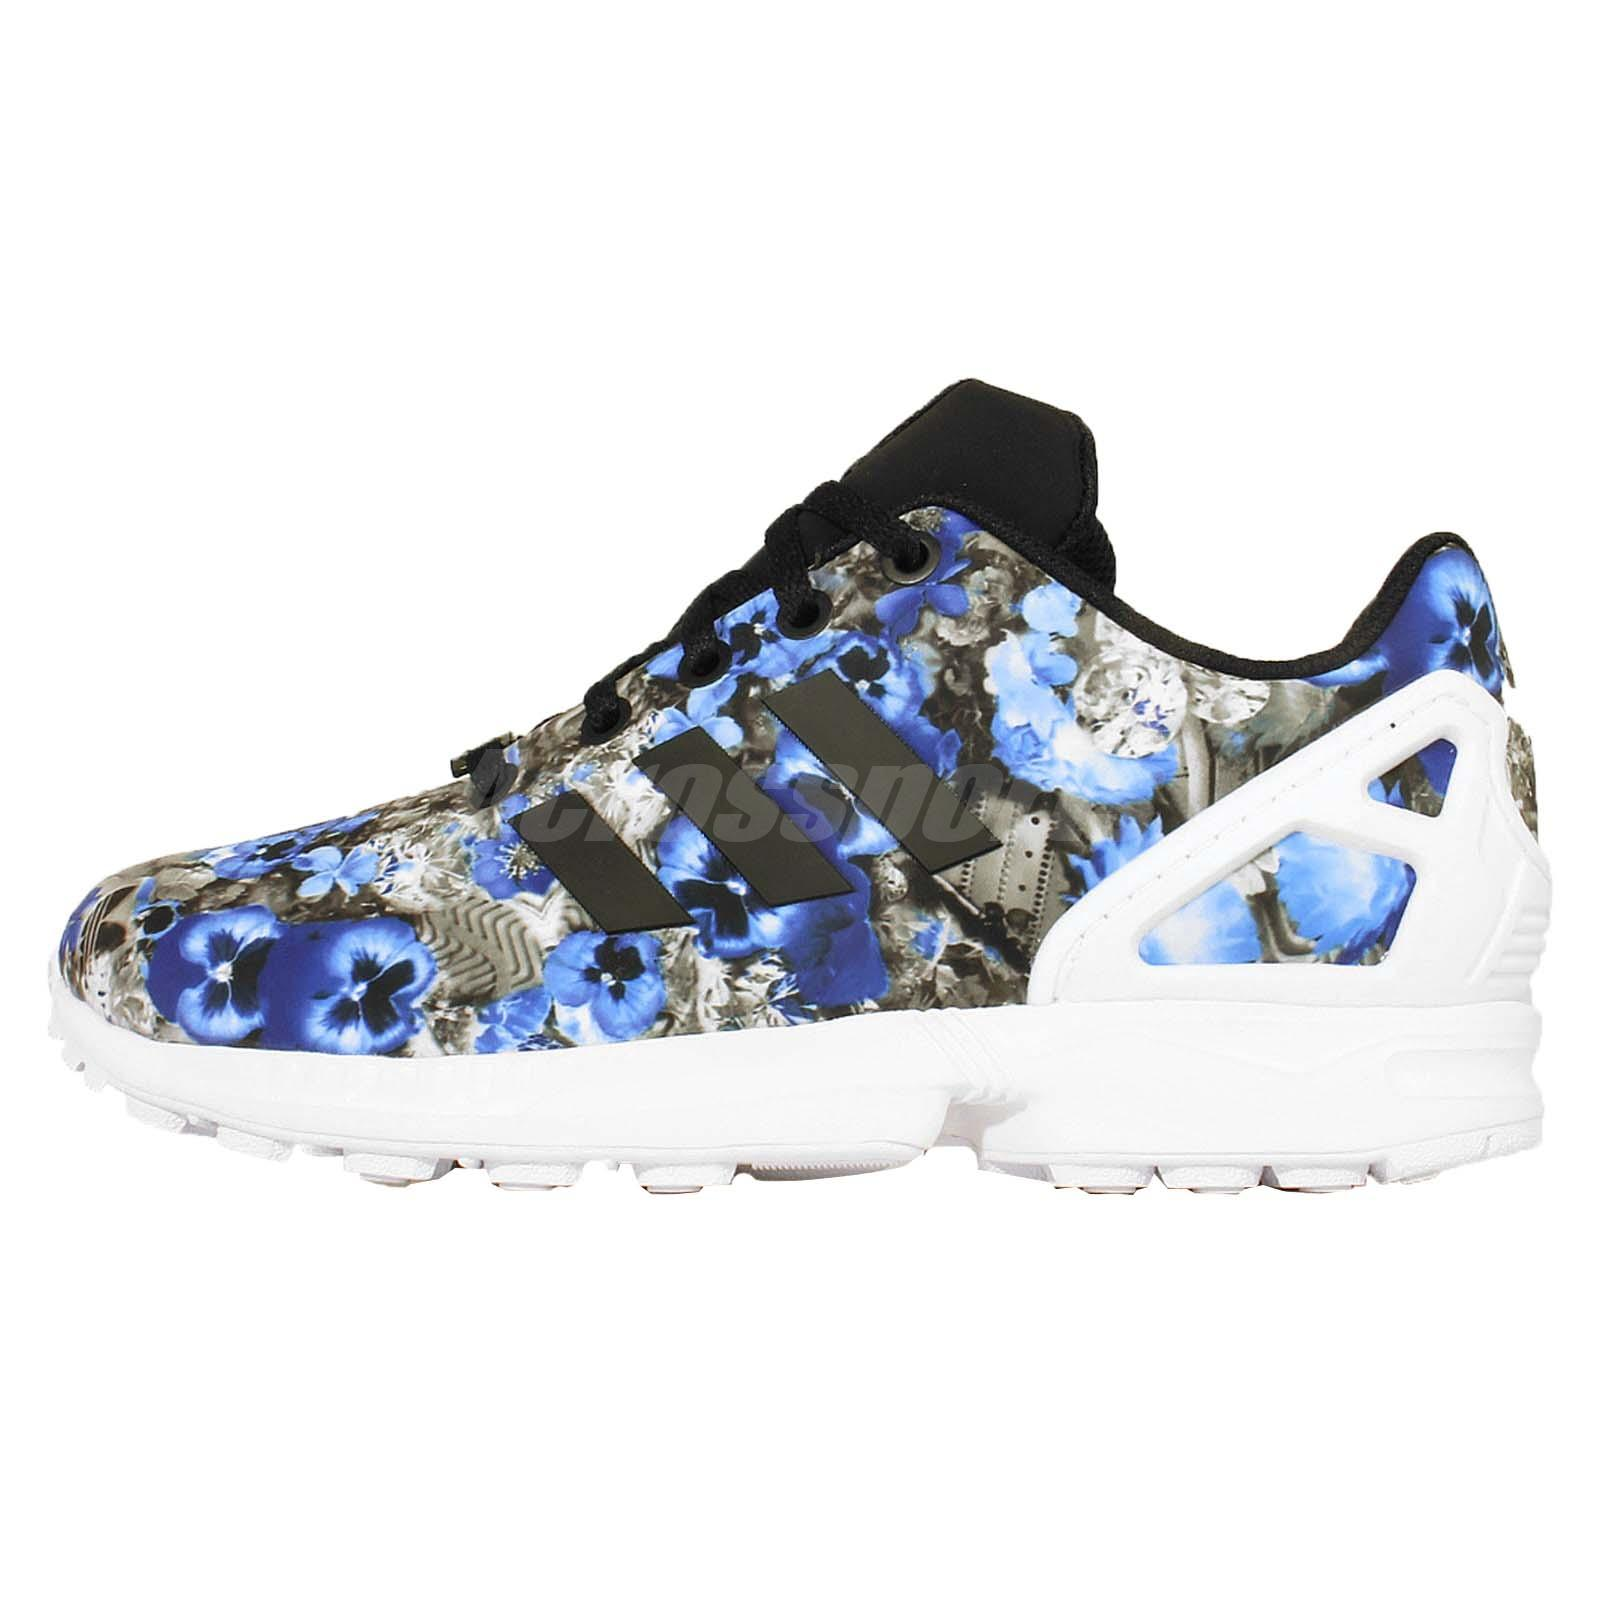 1c496dbb57fe0 Adidas Shoes For Girls Blue softwaretutor.co.uk